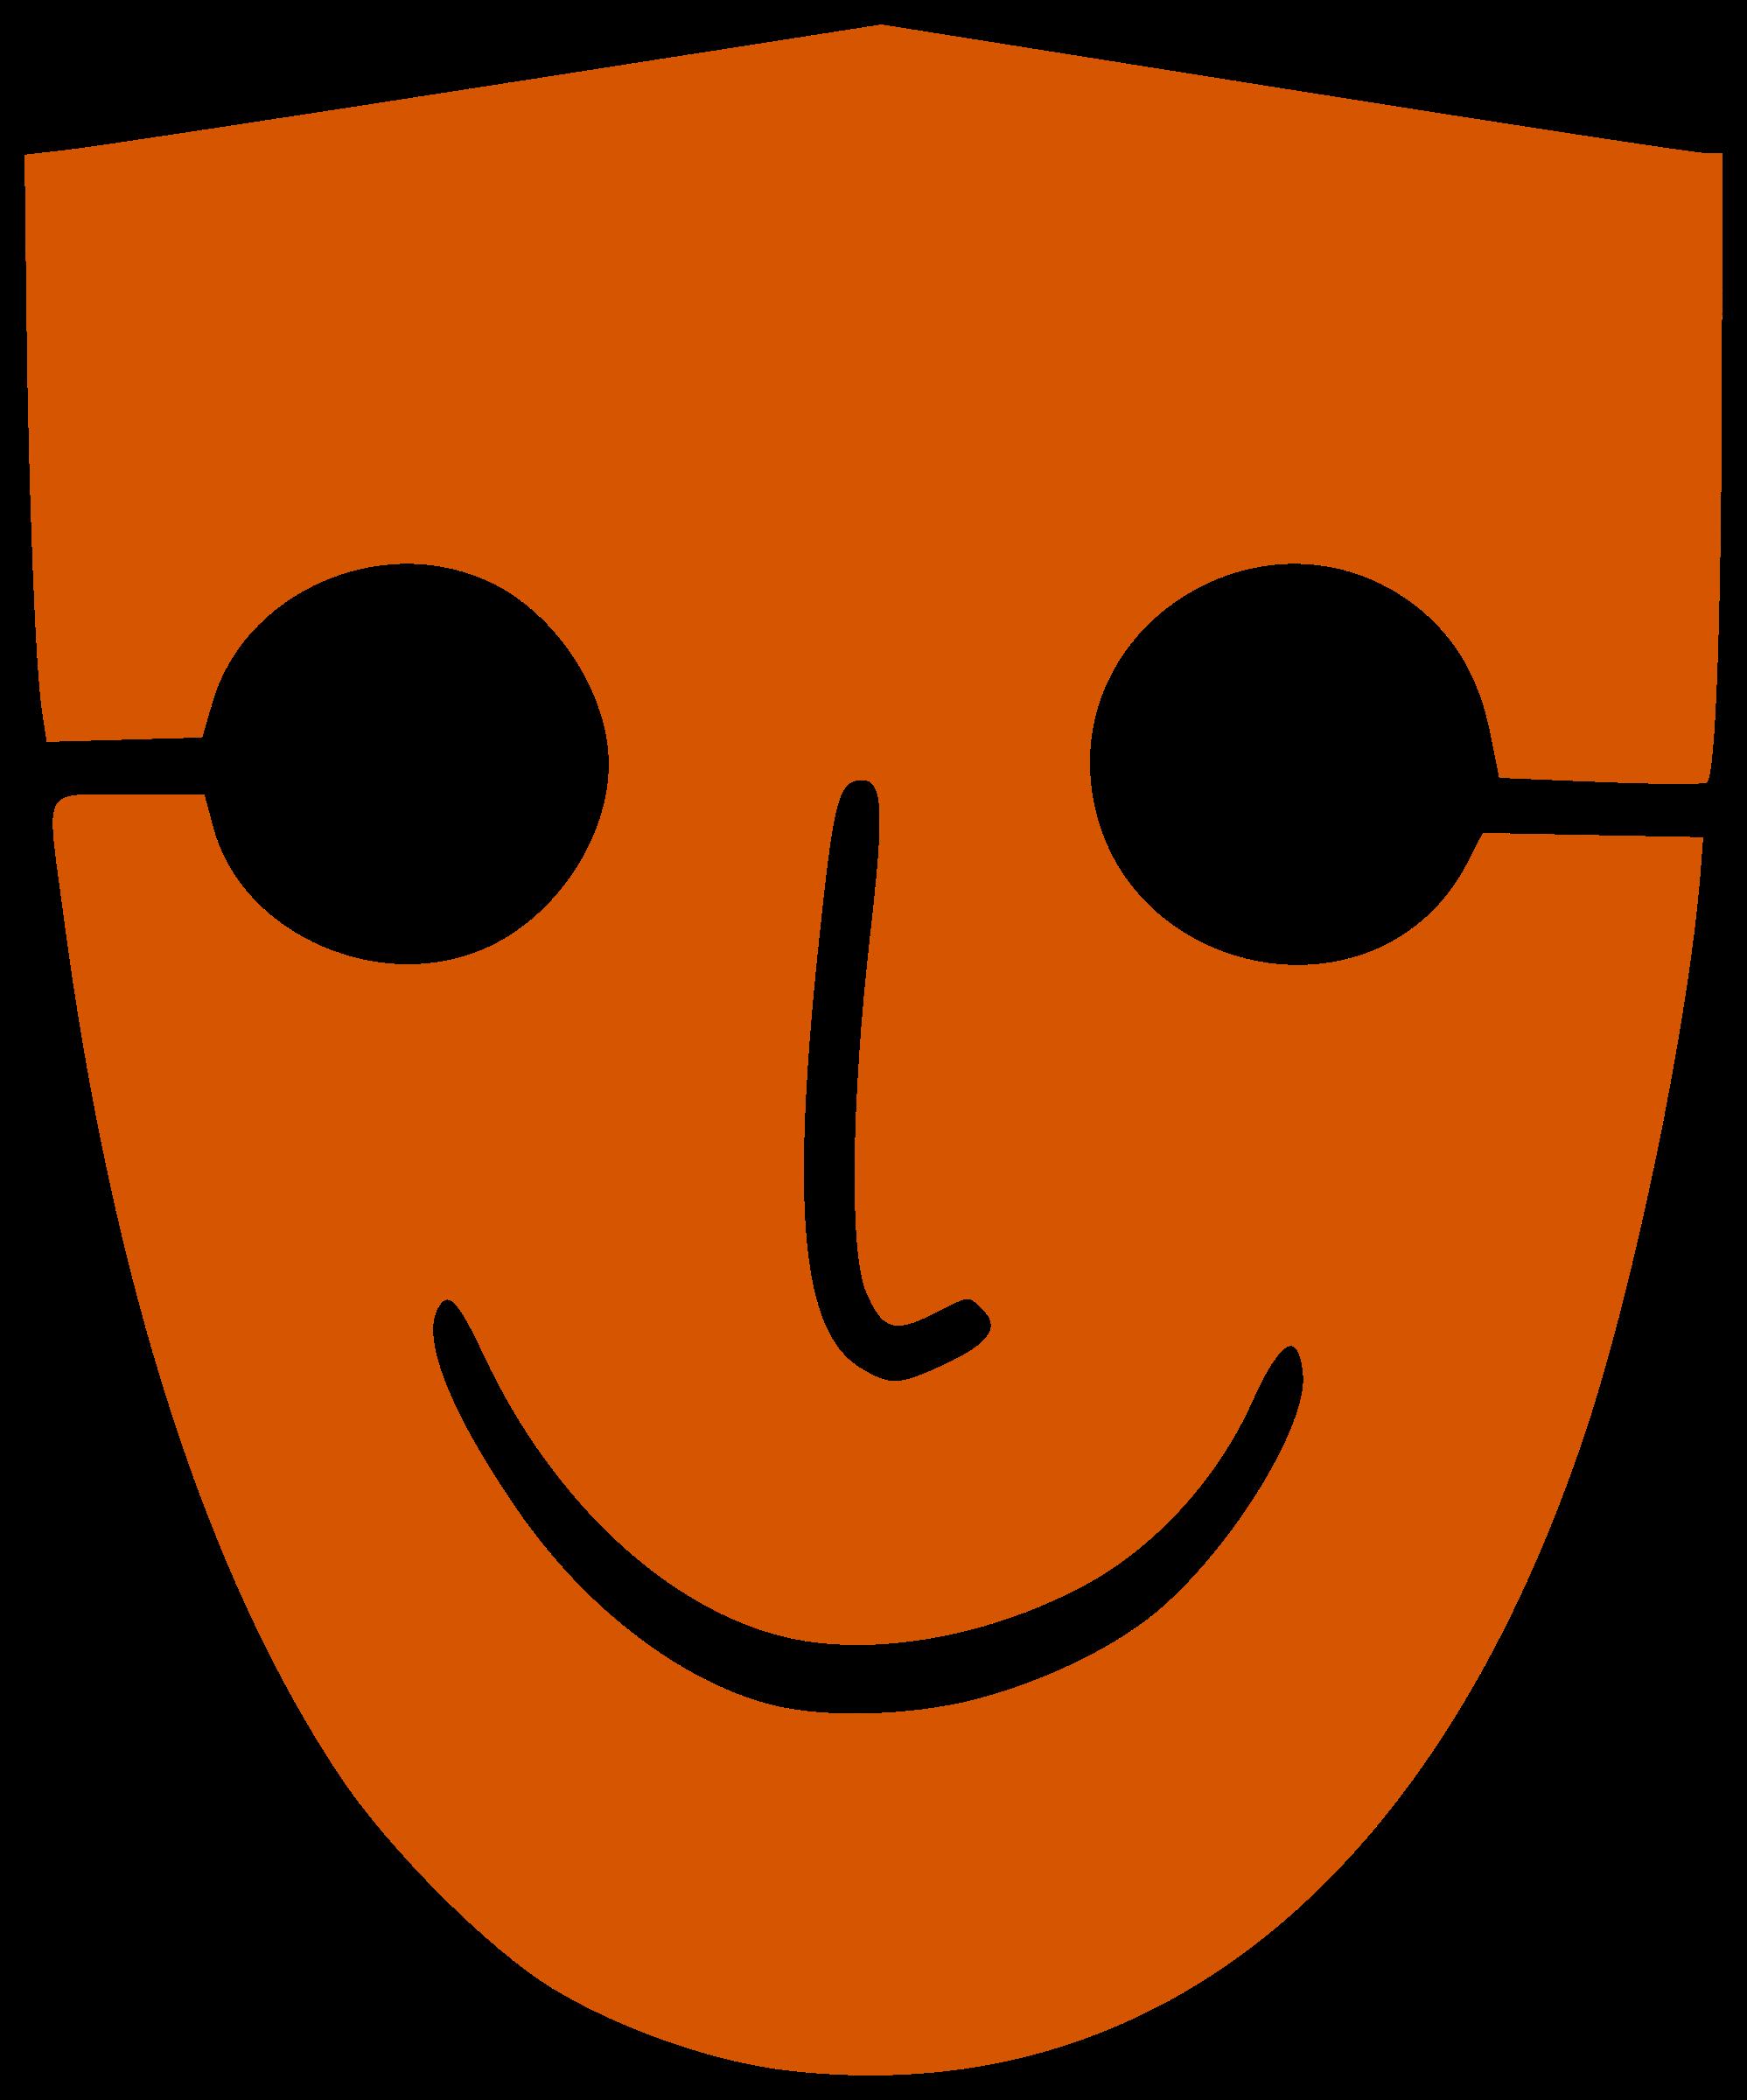 Mask by navaneethks ehauj. Human clipart face